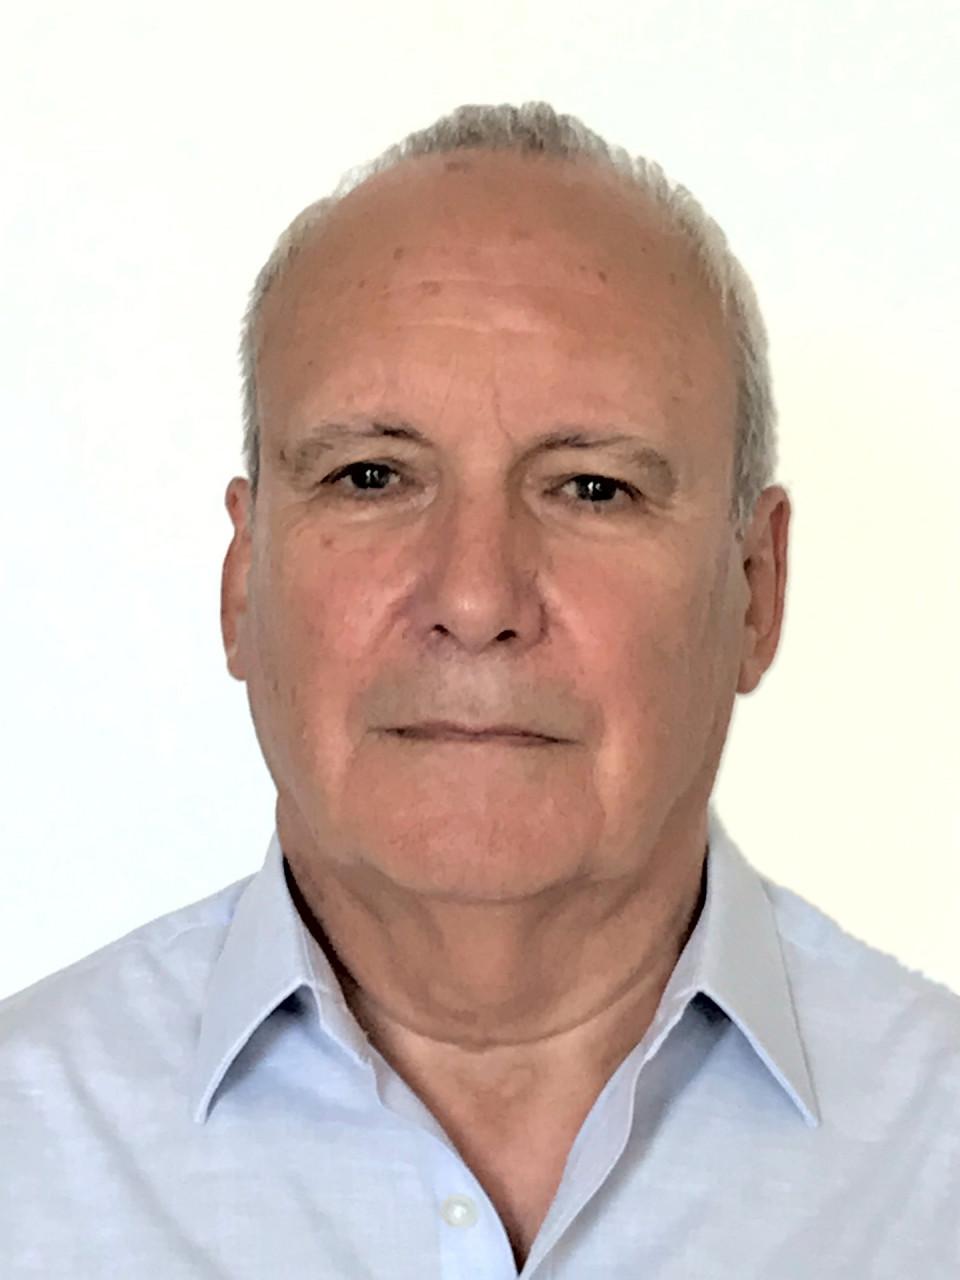 Denis Smalley [Photo: George Kinnear, July 2019]